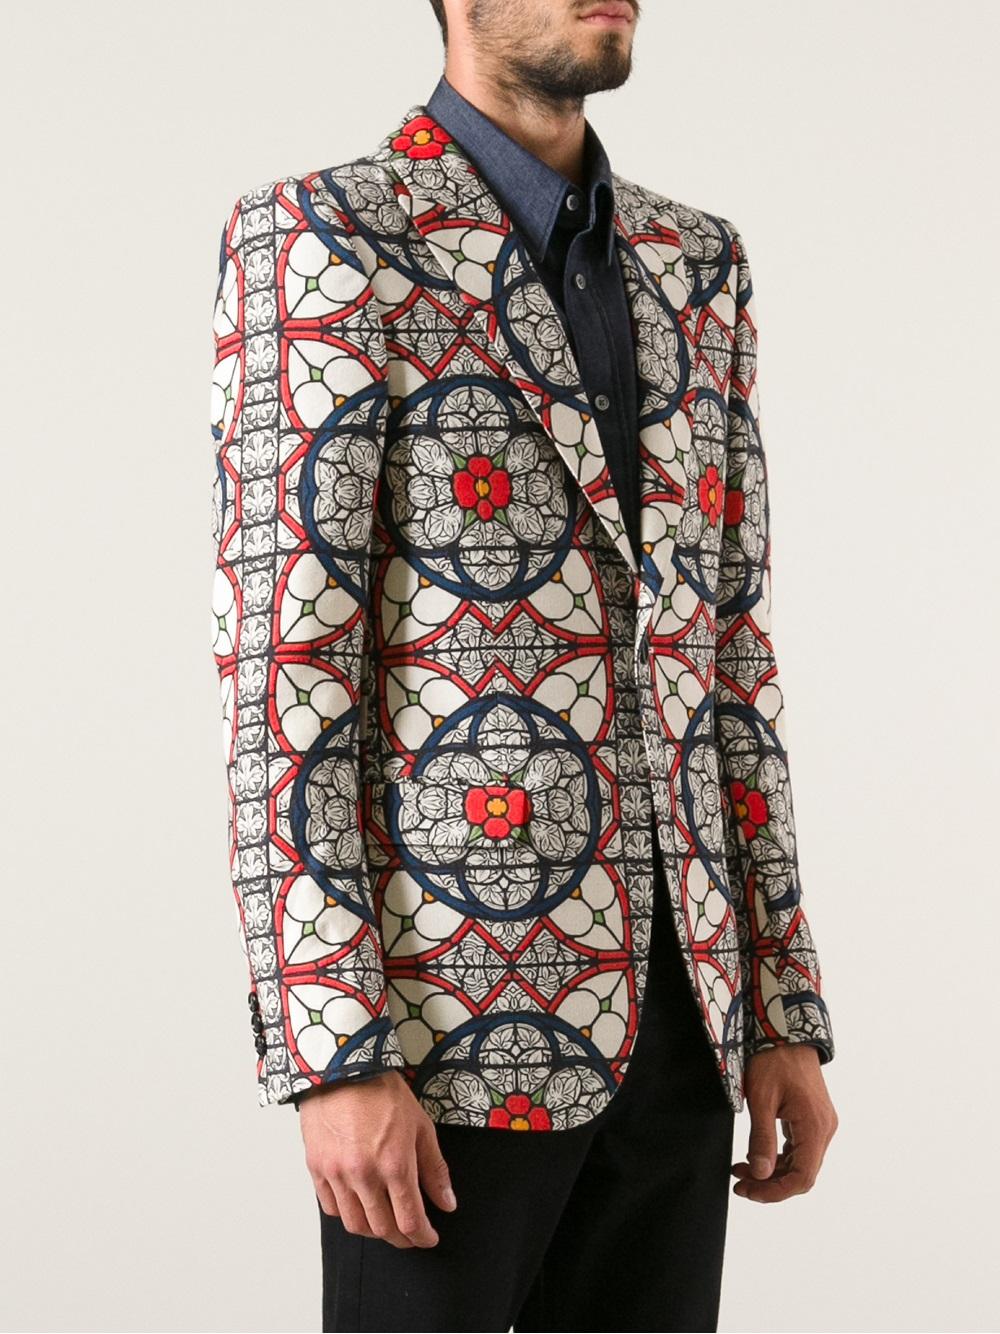 Mens Patterned Blazers Amazing Inspiration Ideas